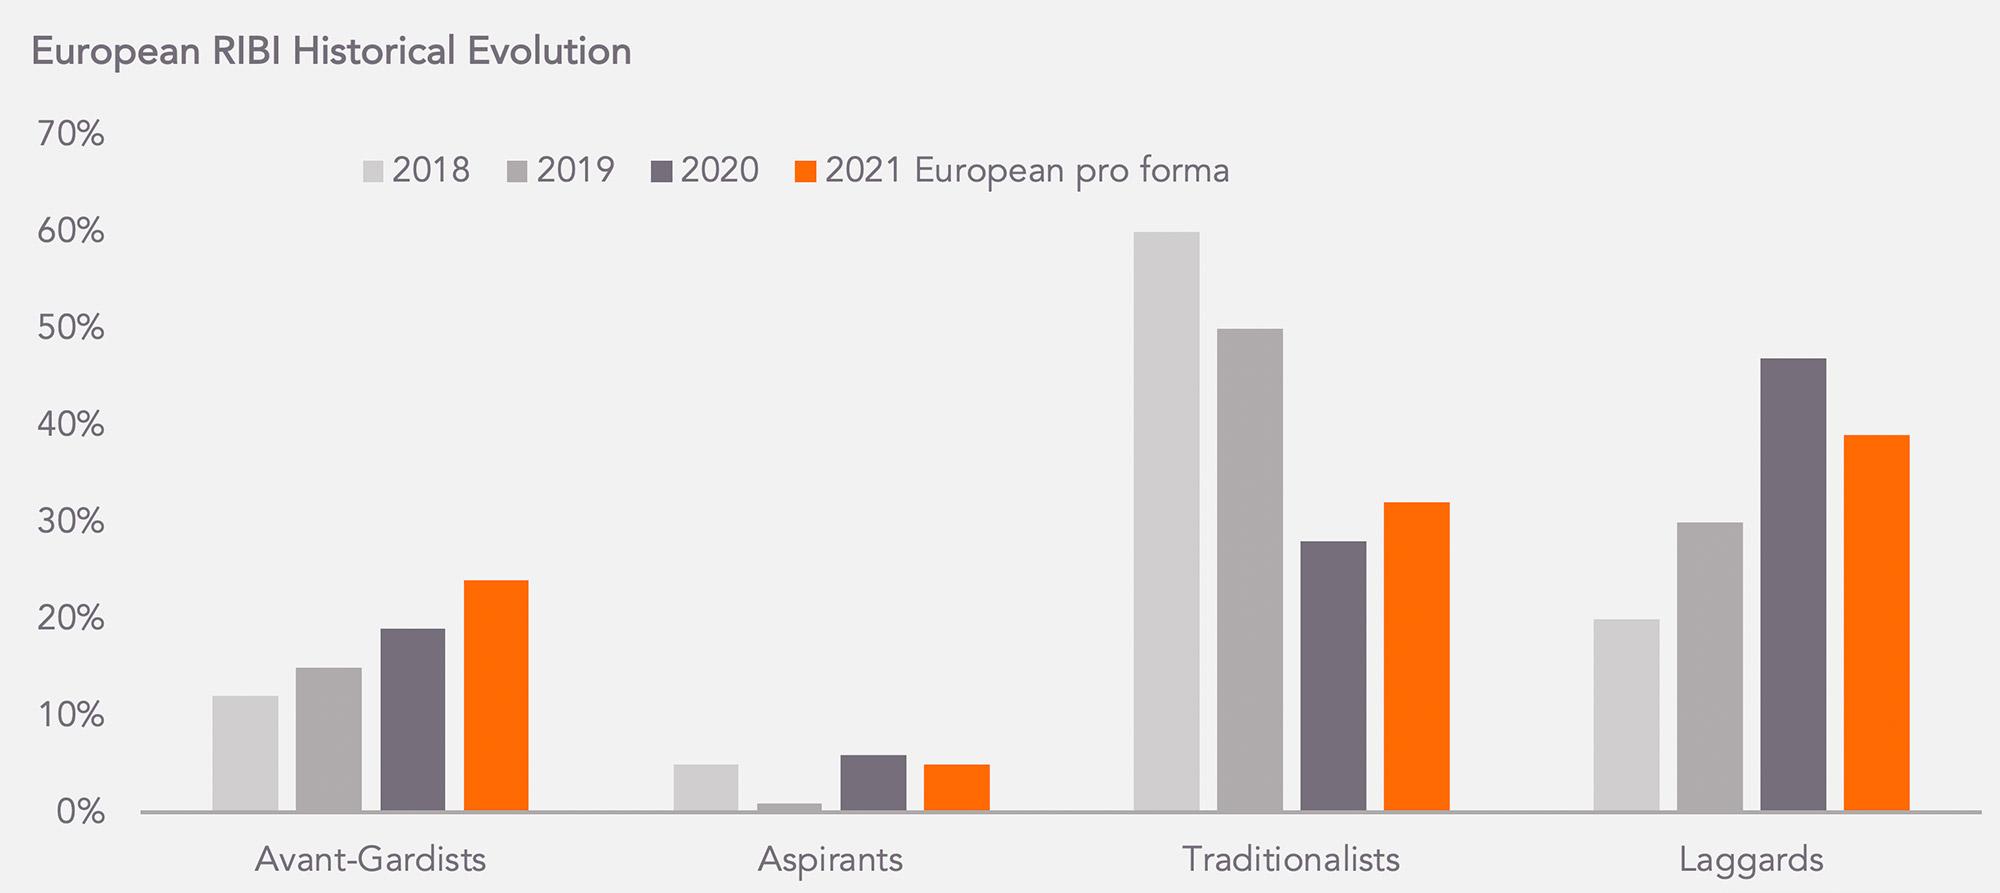 RIBI 2021 vs 2020 and 2019